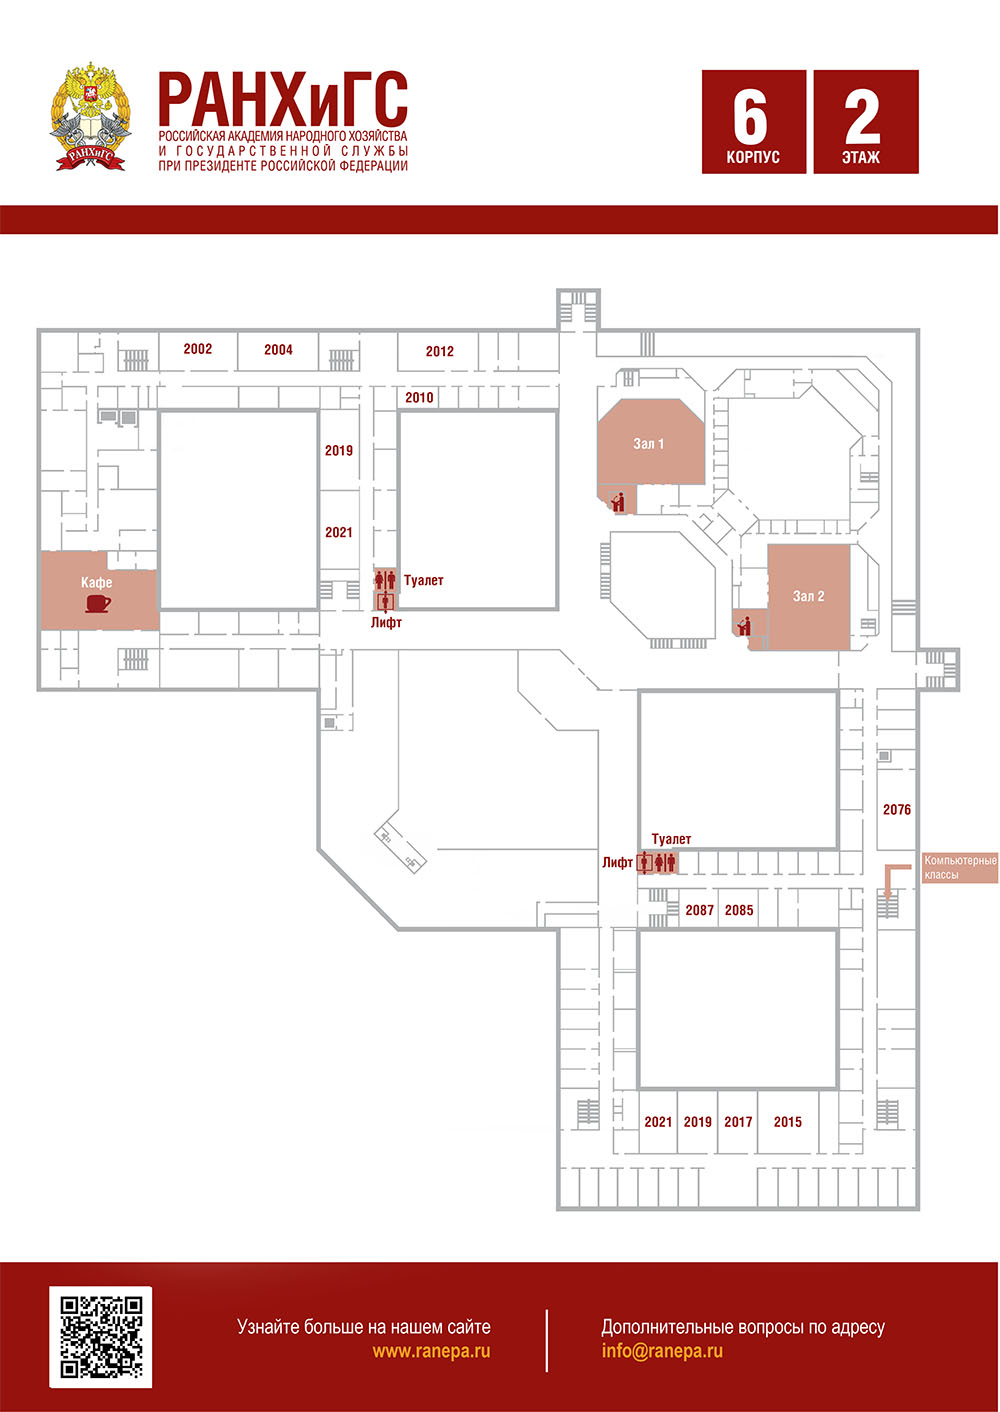 Ранхигс корпус 2 схема